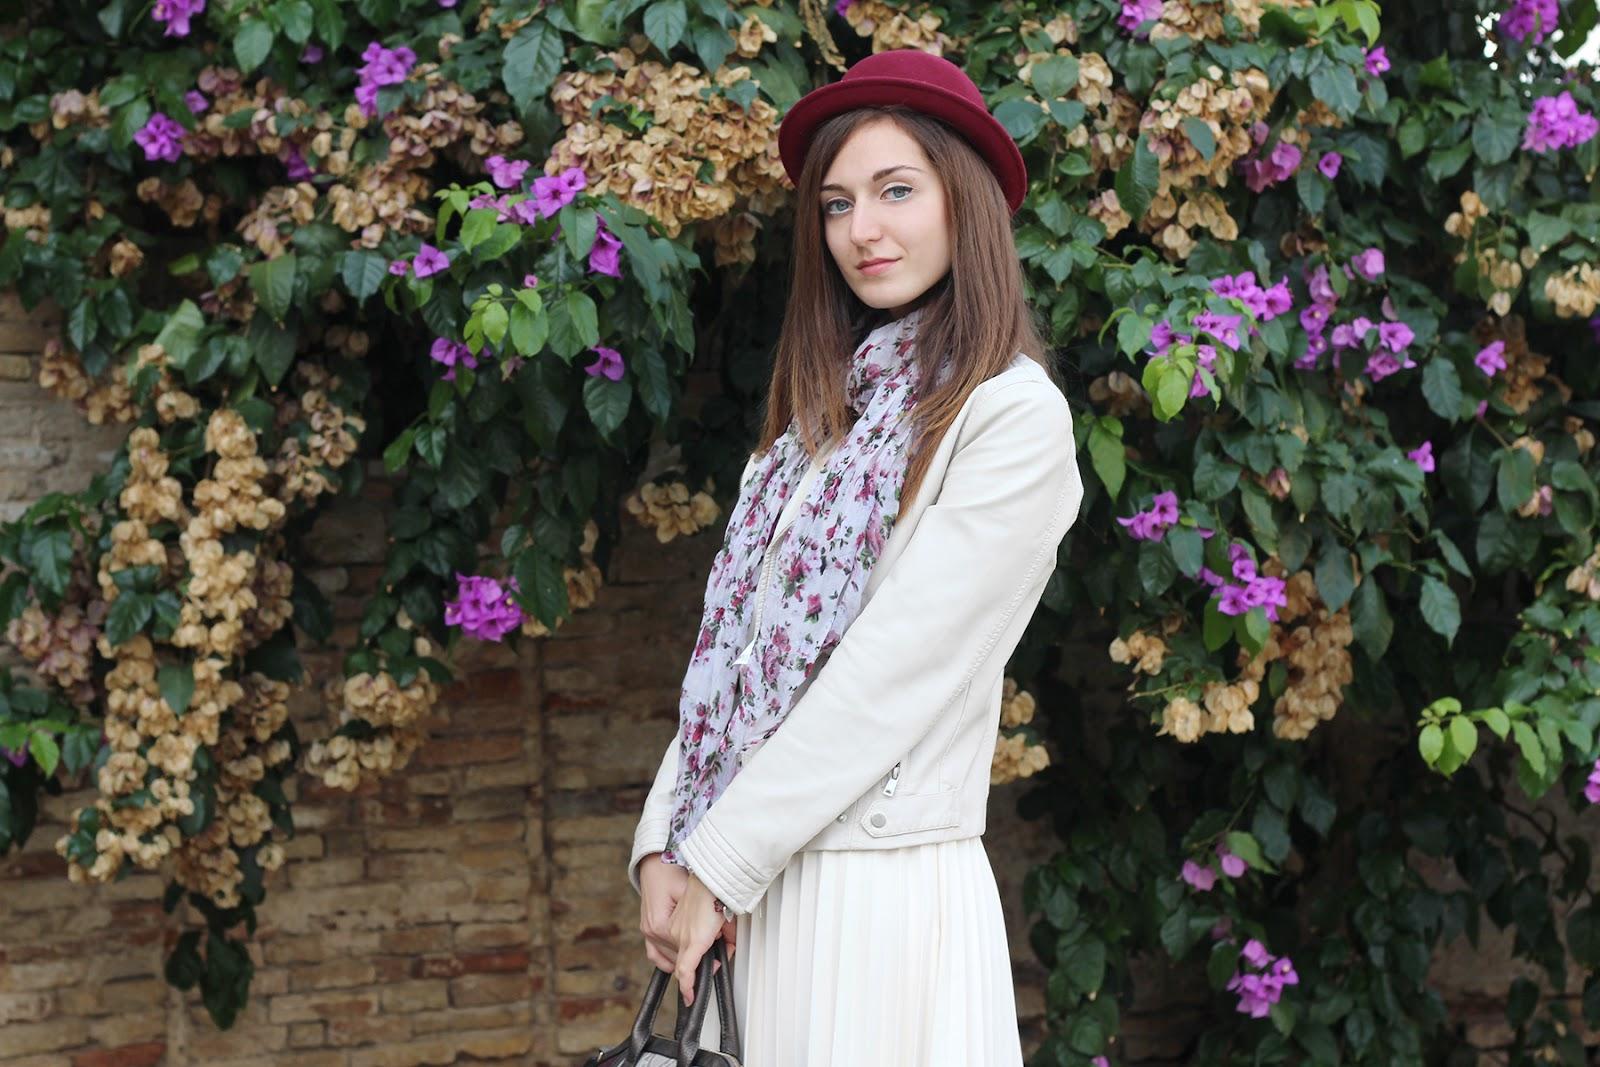 outfit ootd italian fashion blogger cream burgundy zara bijou brigitte plissé skirt jacket leather hat ovine scarf